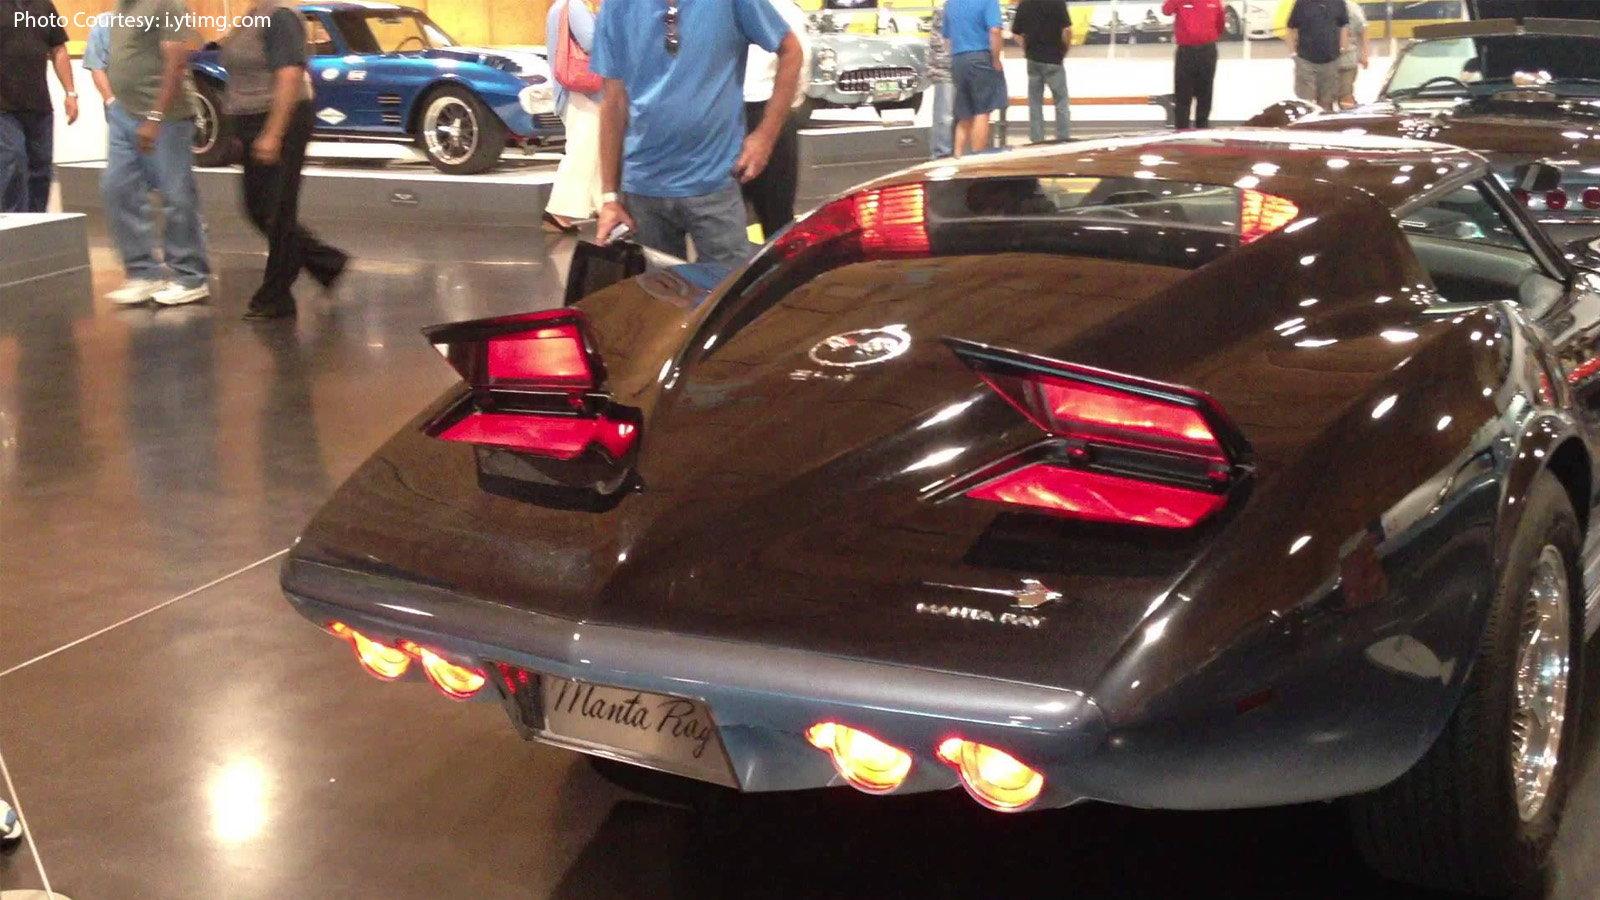 1969 Chevrolet Manta Ray Concept